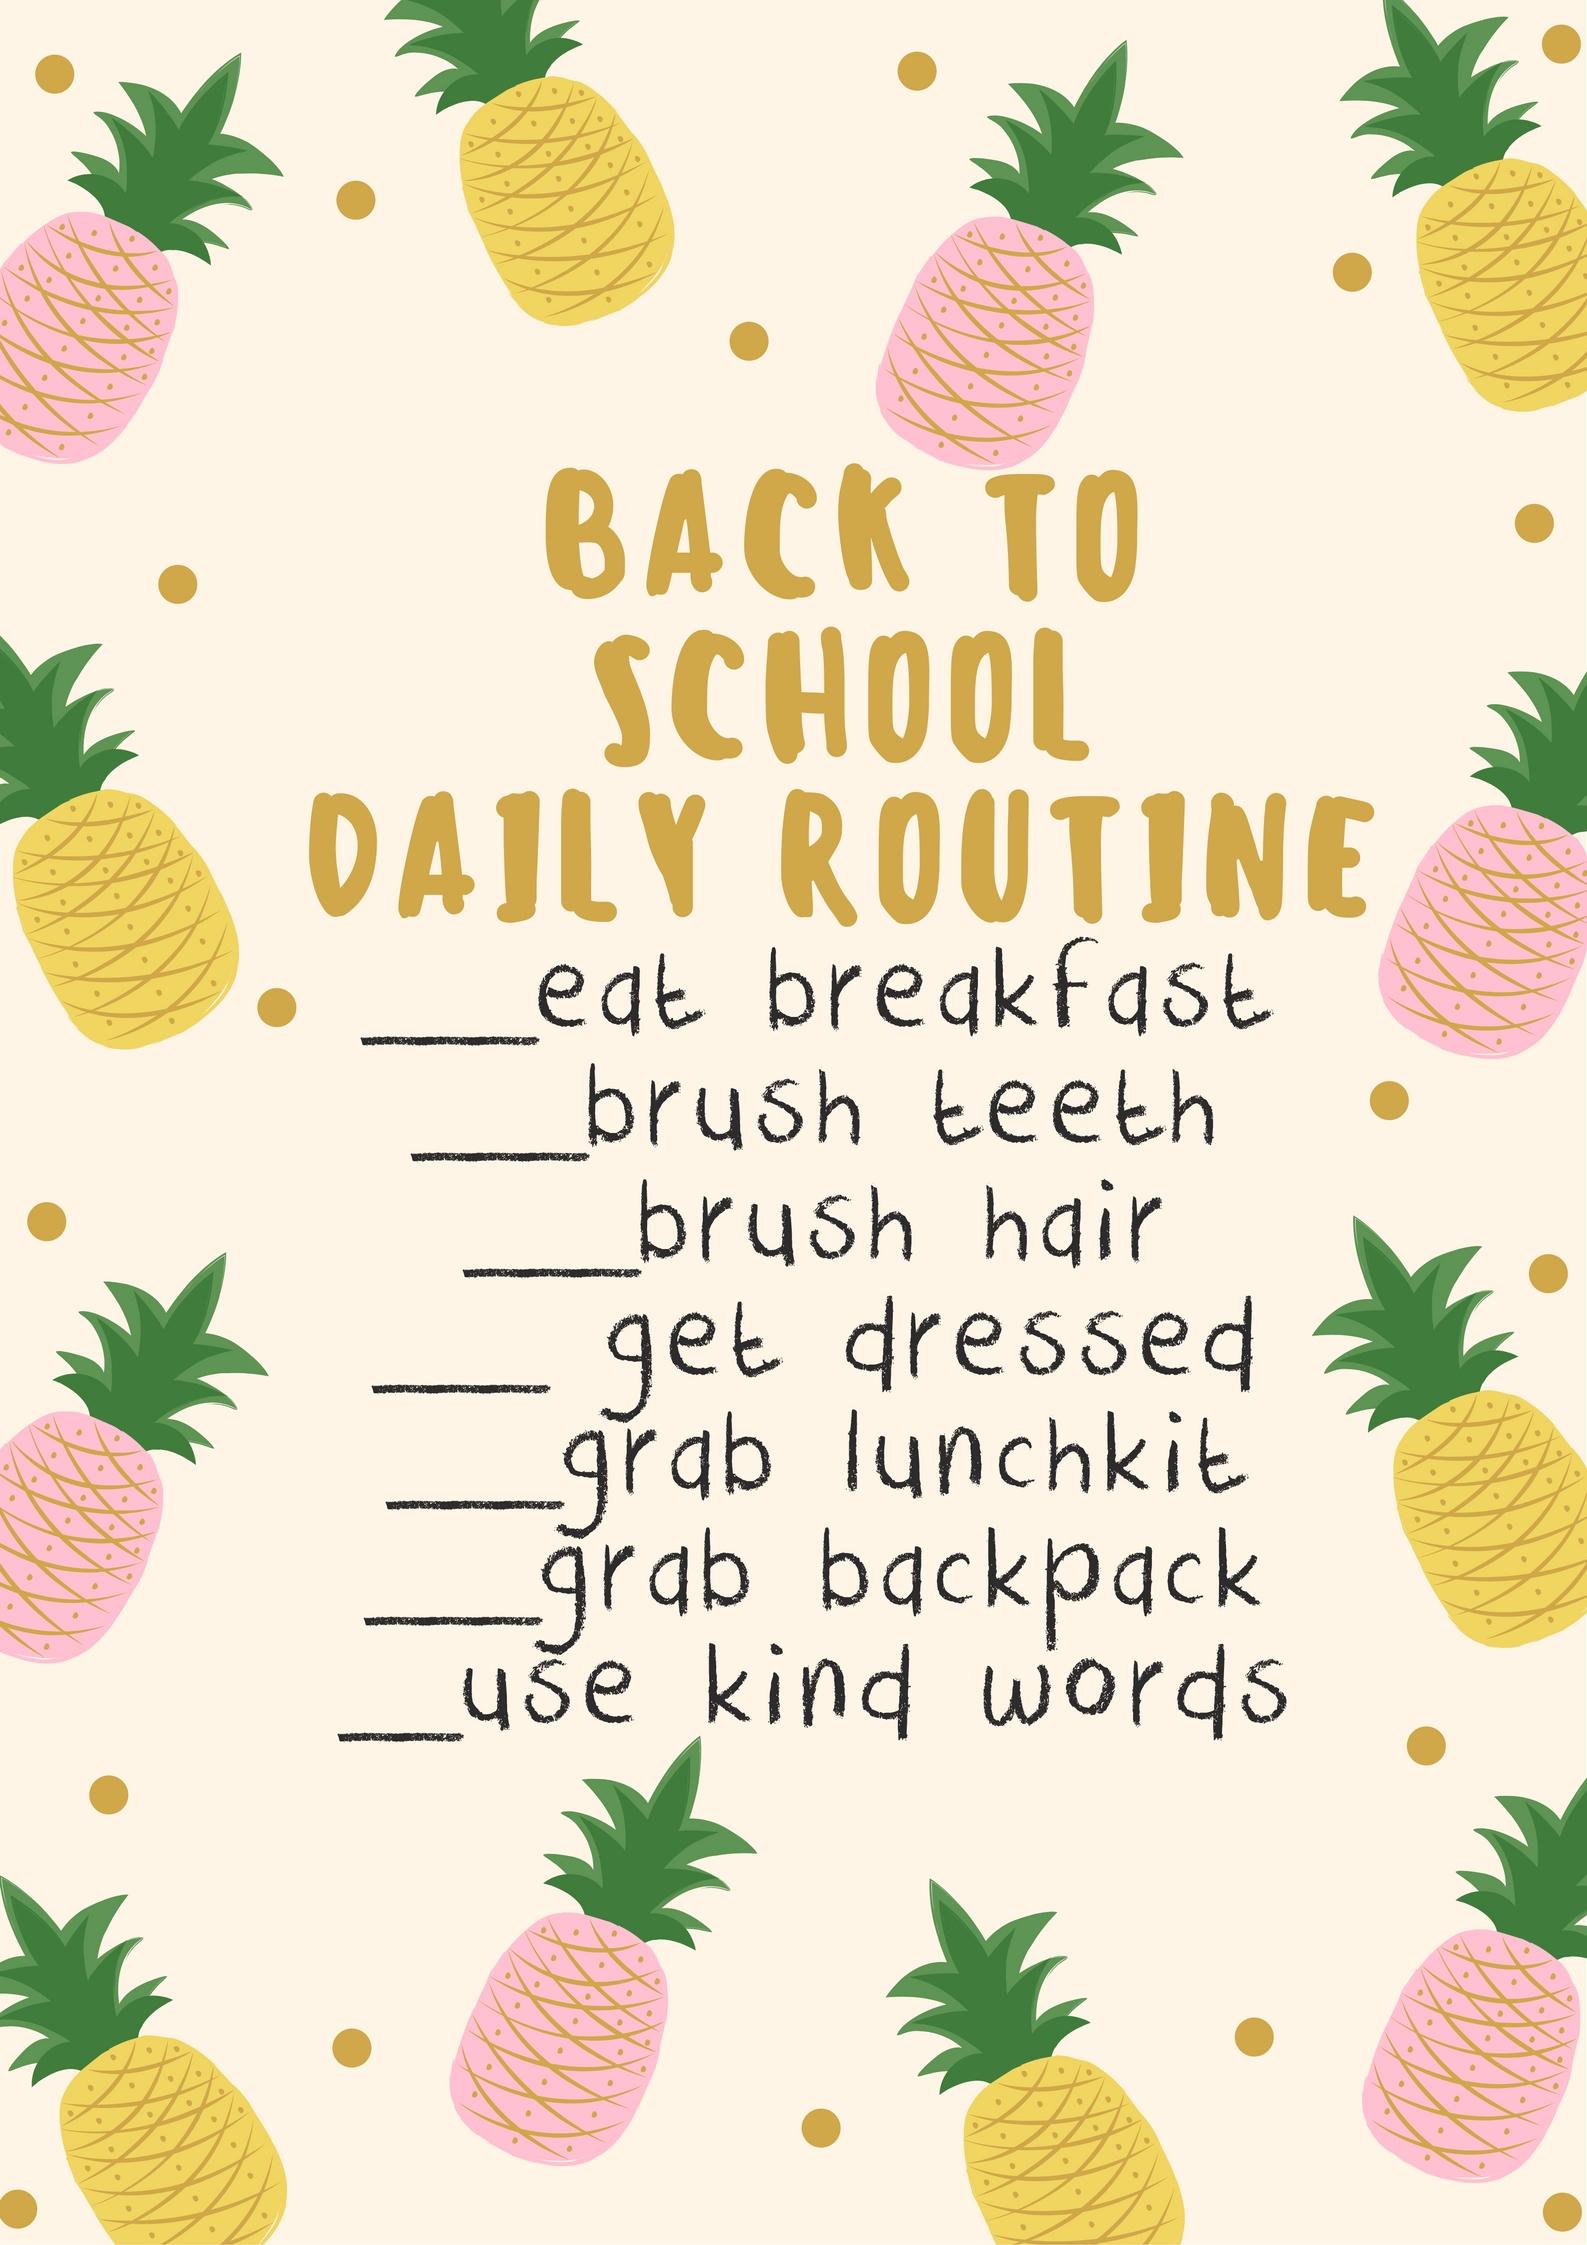 Back to school routine checklist